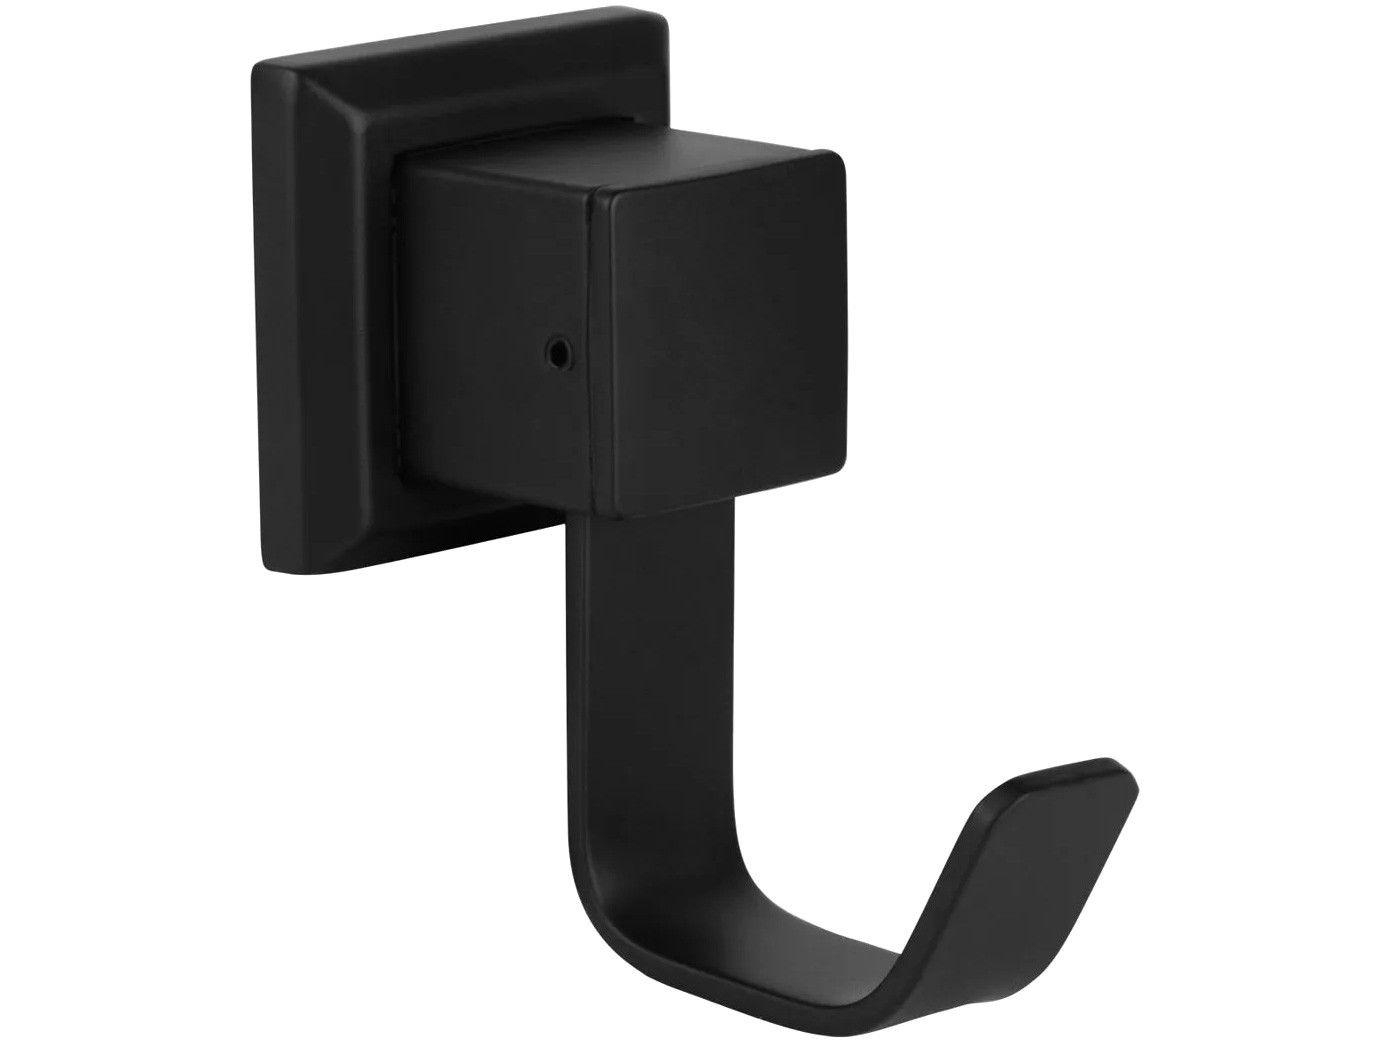 Cabide para Banheiro Inox Preto Fosco Black - BL6060 Ducon Metais